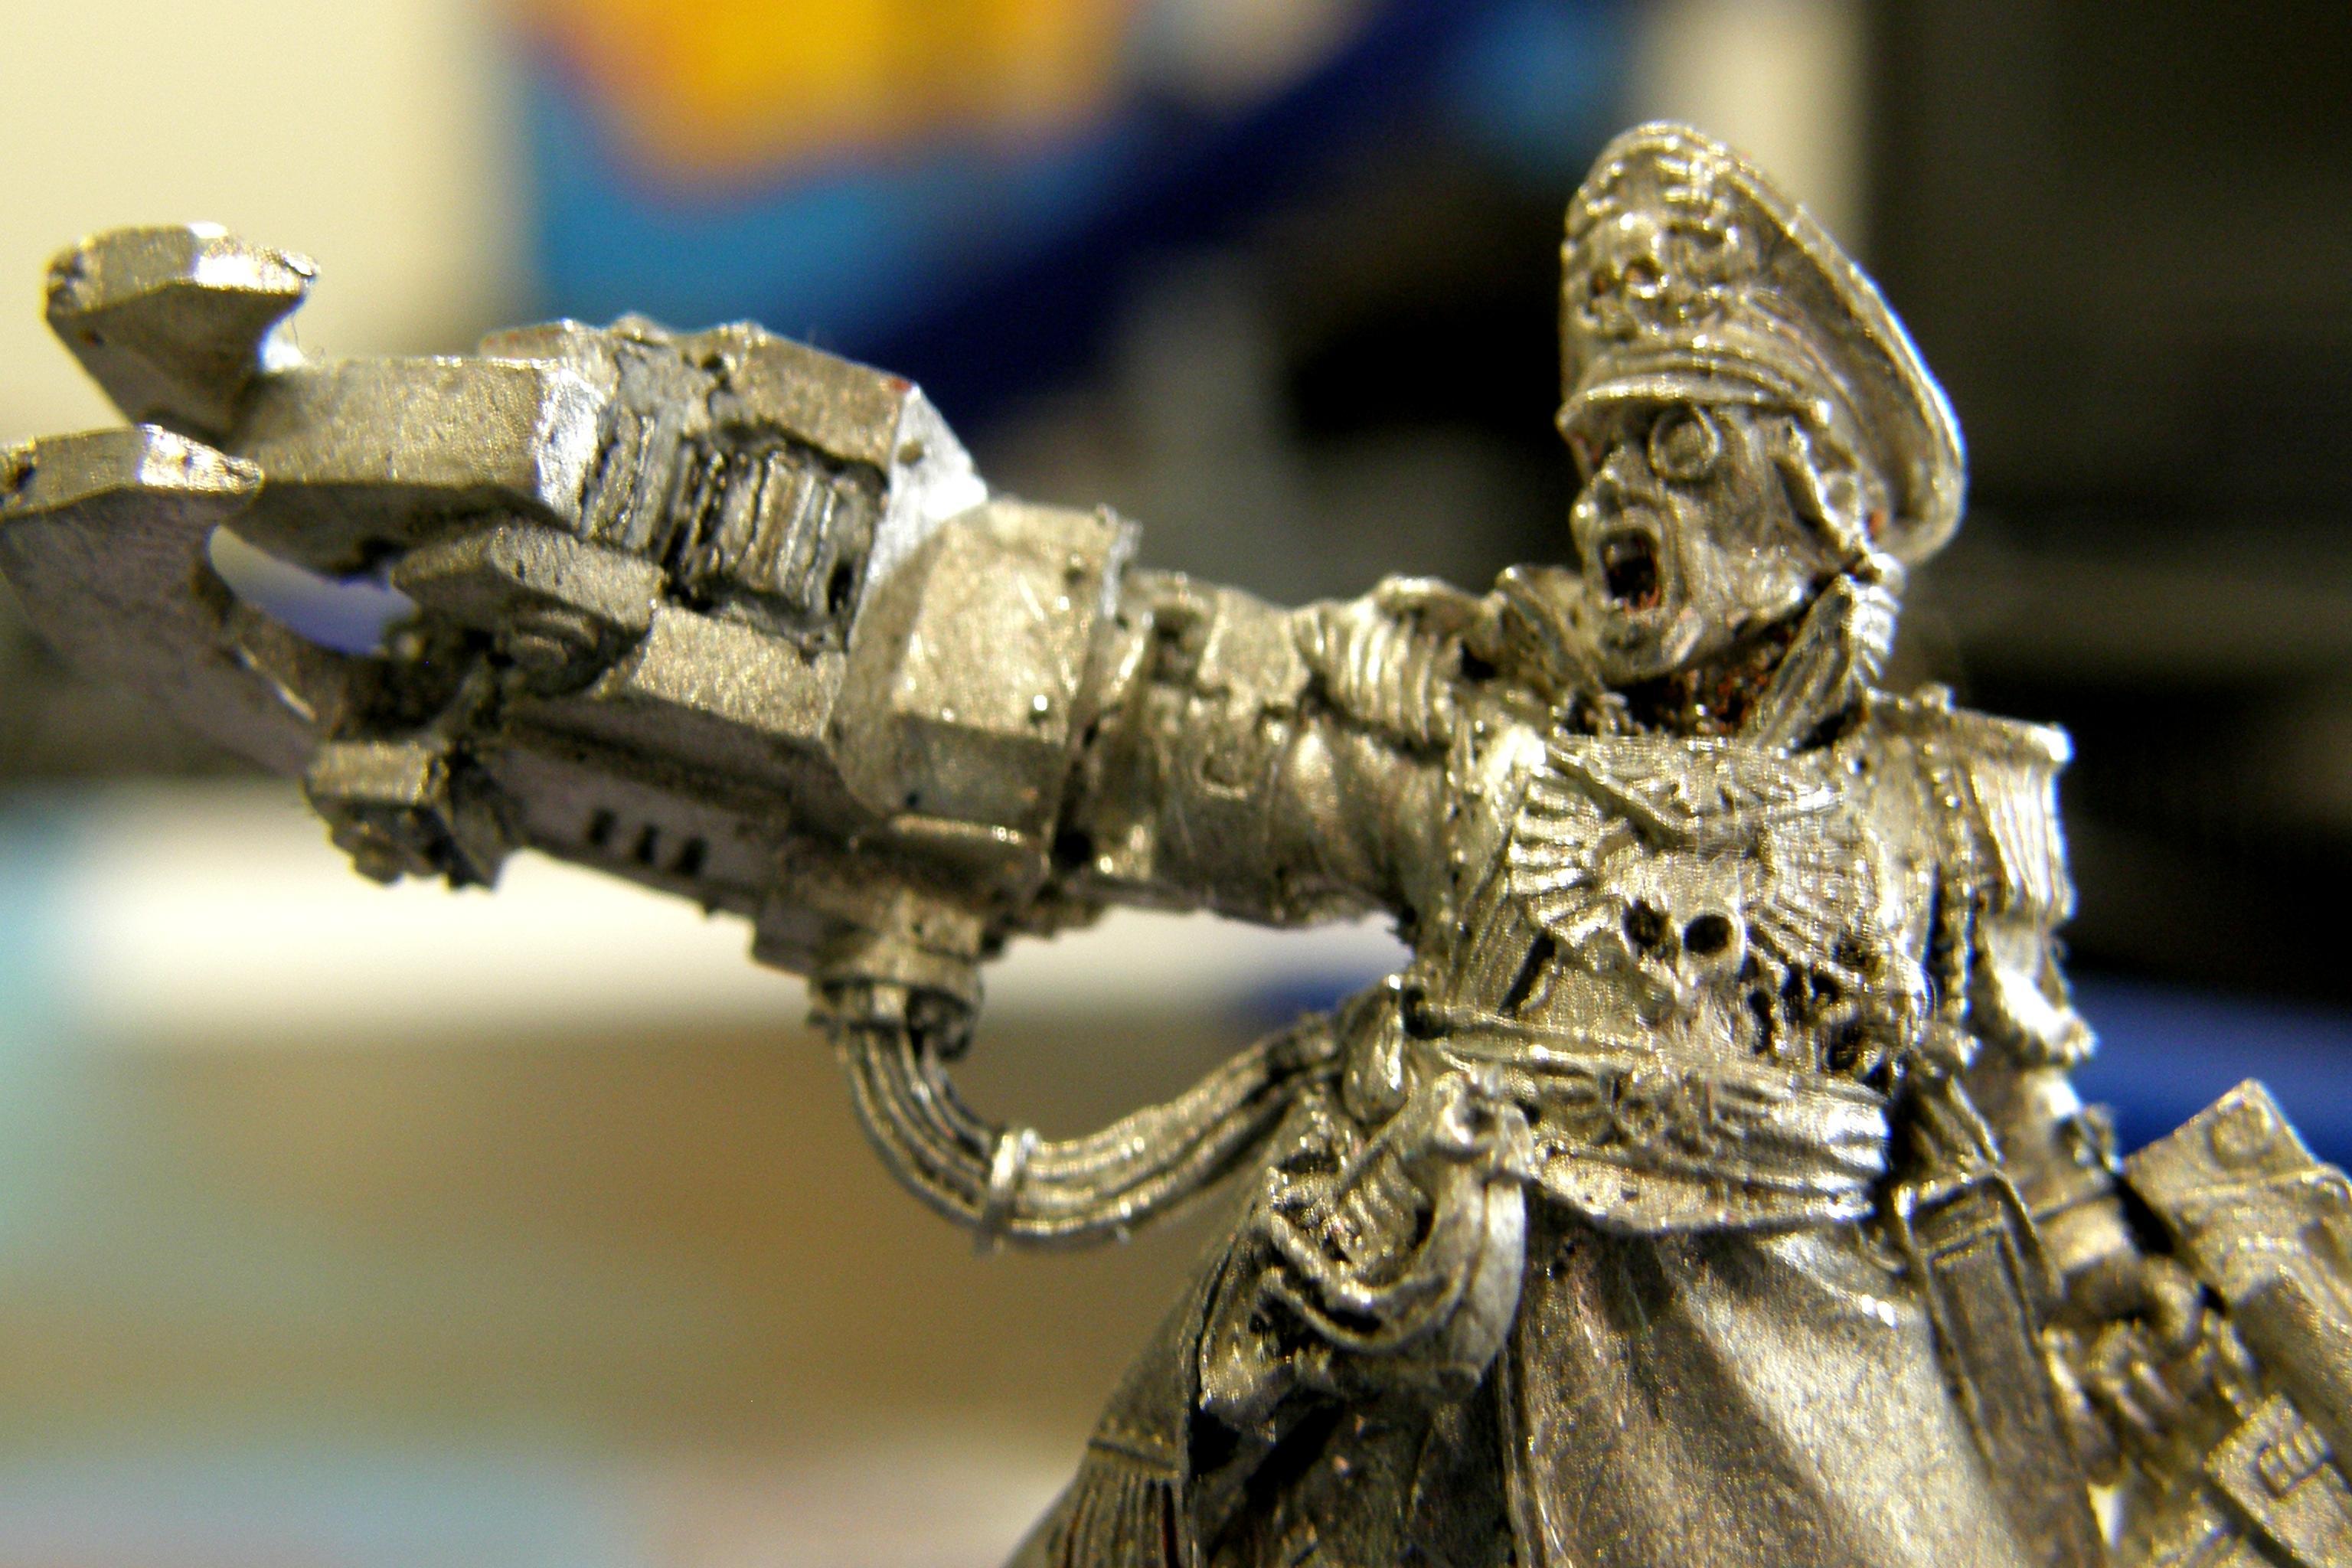 Imperial Guard, Metals, Painting, Repaint, Work In Progress